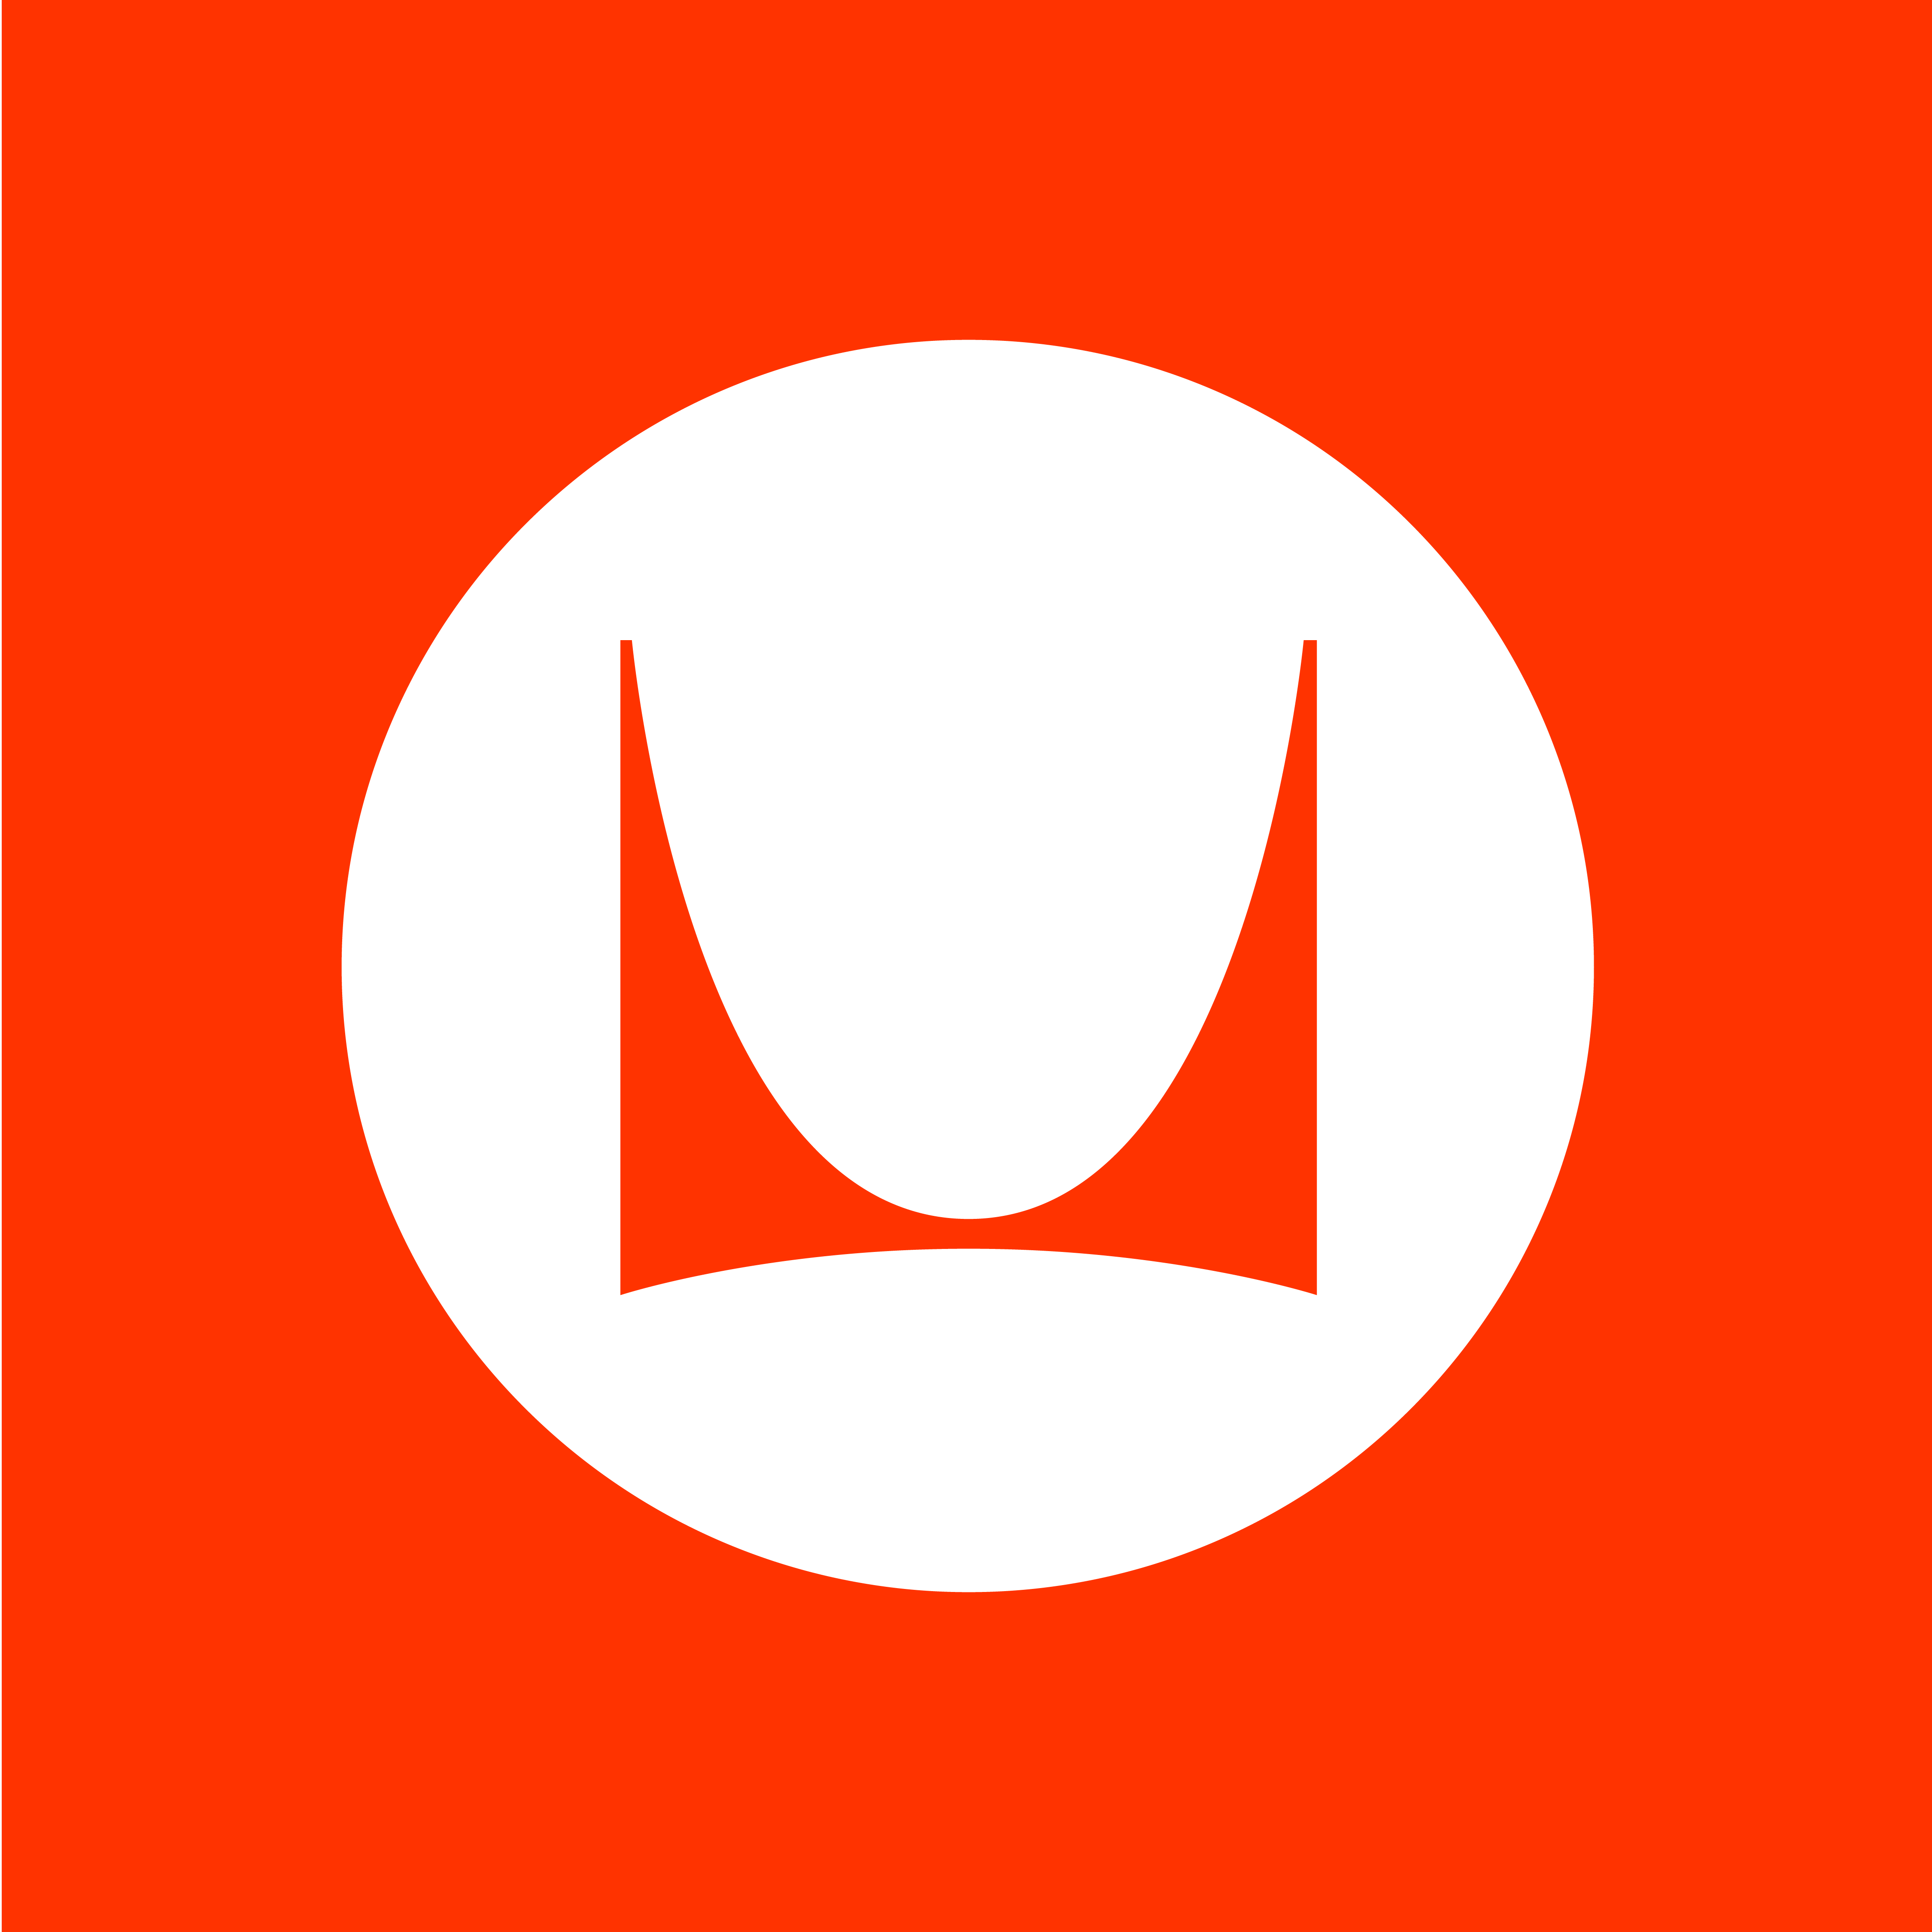 Herman Miller Designer Irving Harper Modified By John Massey Firm George Nelson Associates Usa Year 1946 Modifie Logo Design Corporate Logo Logo Mark